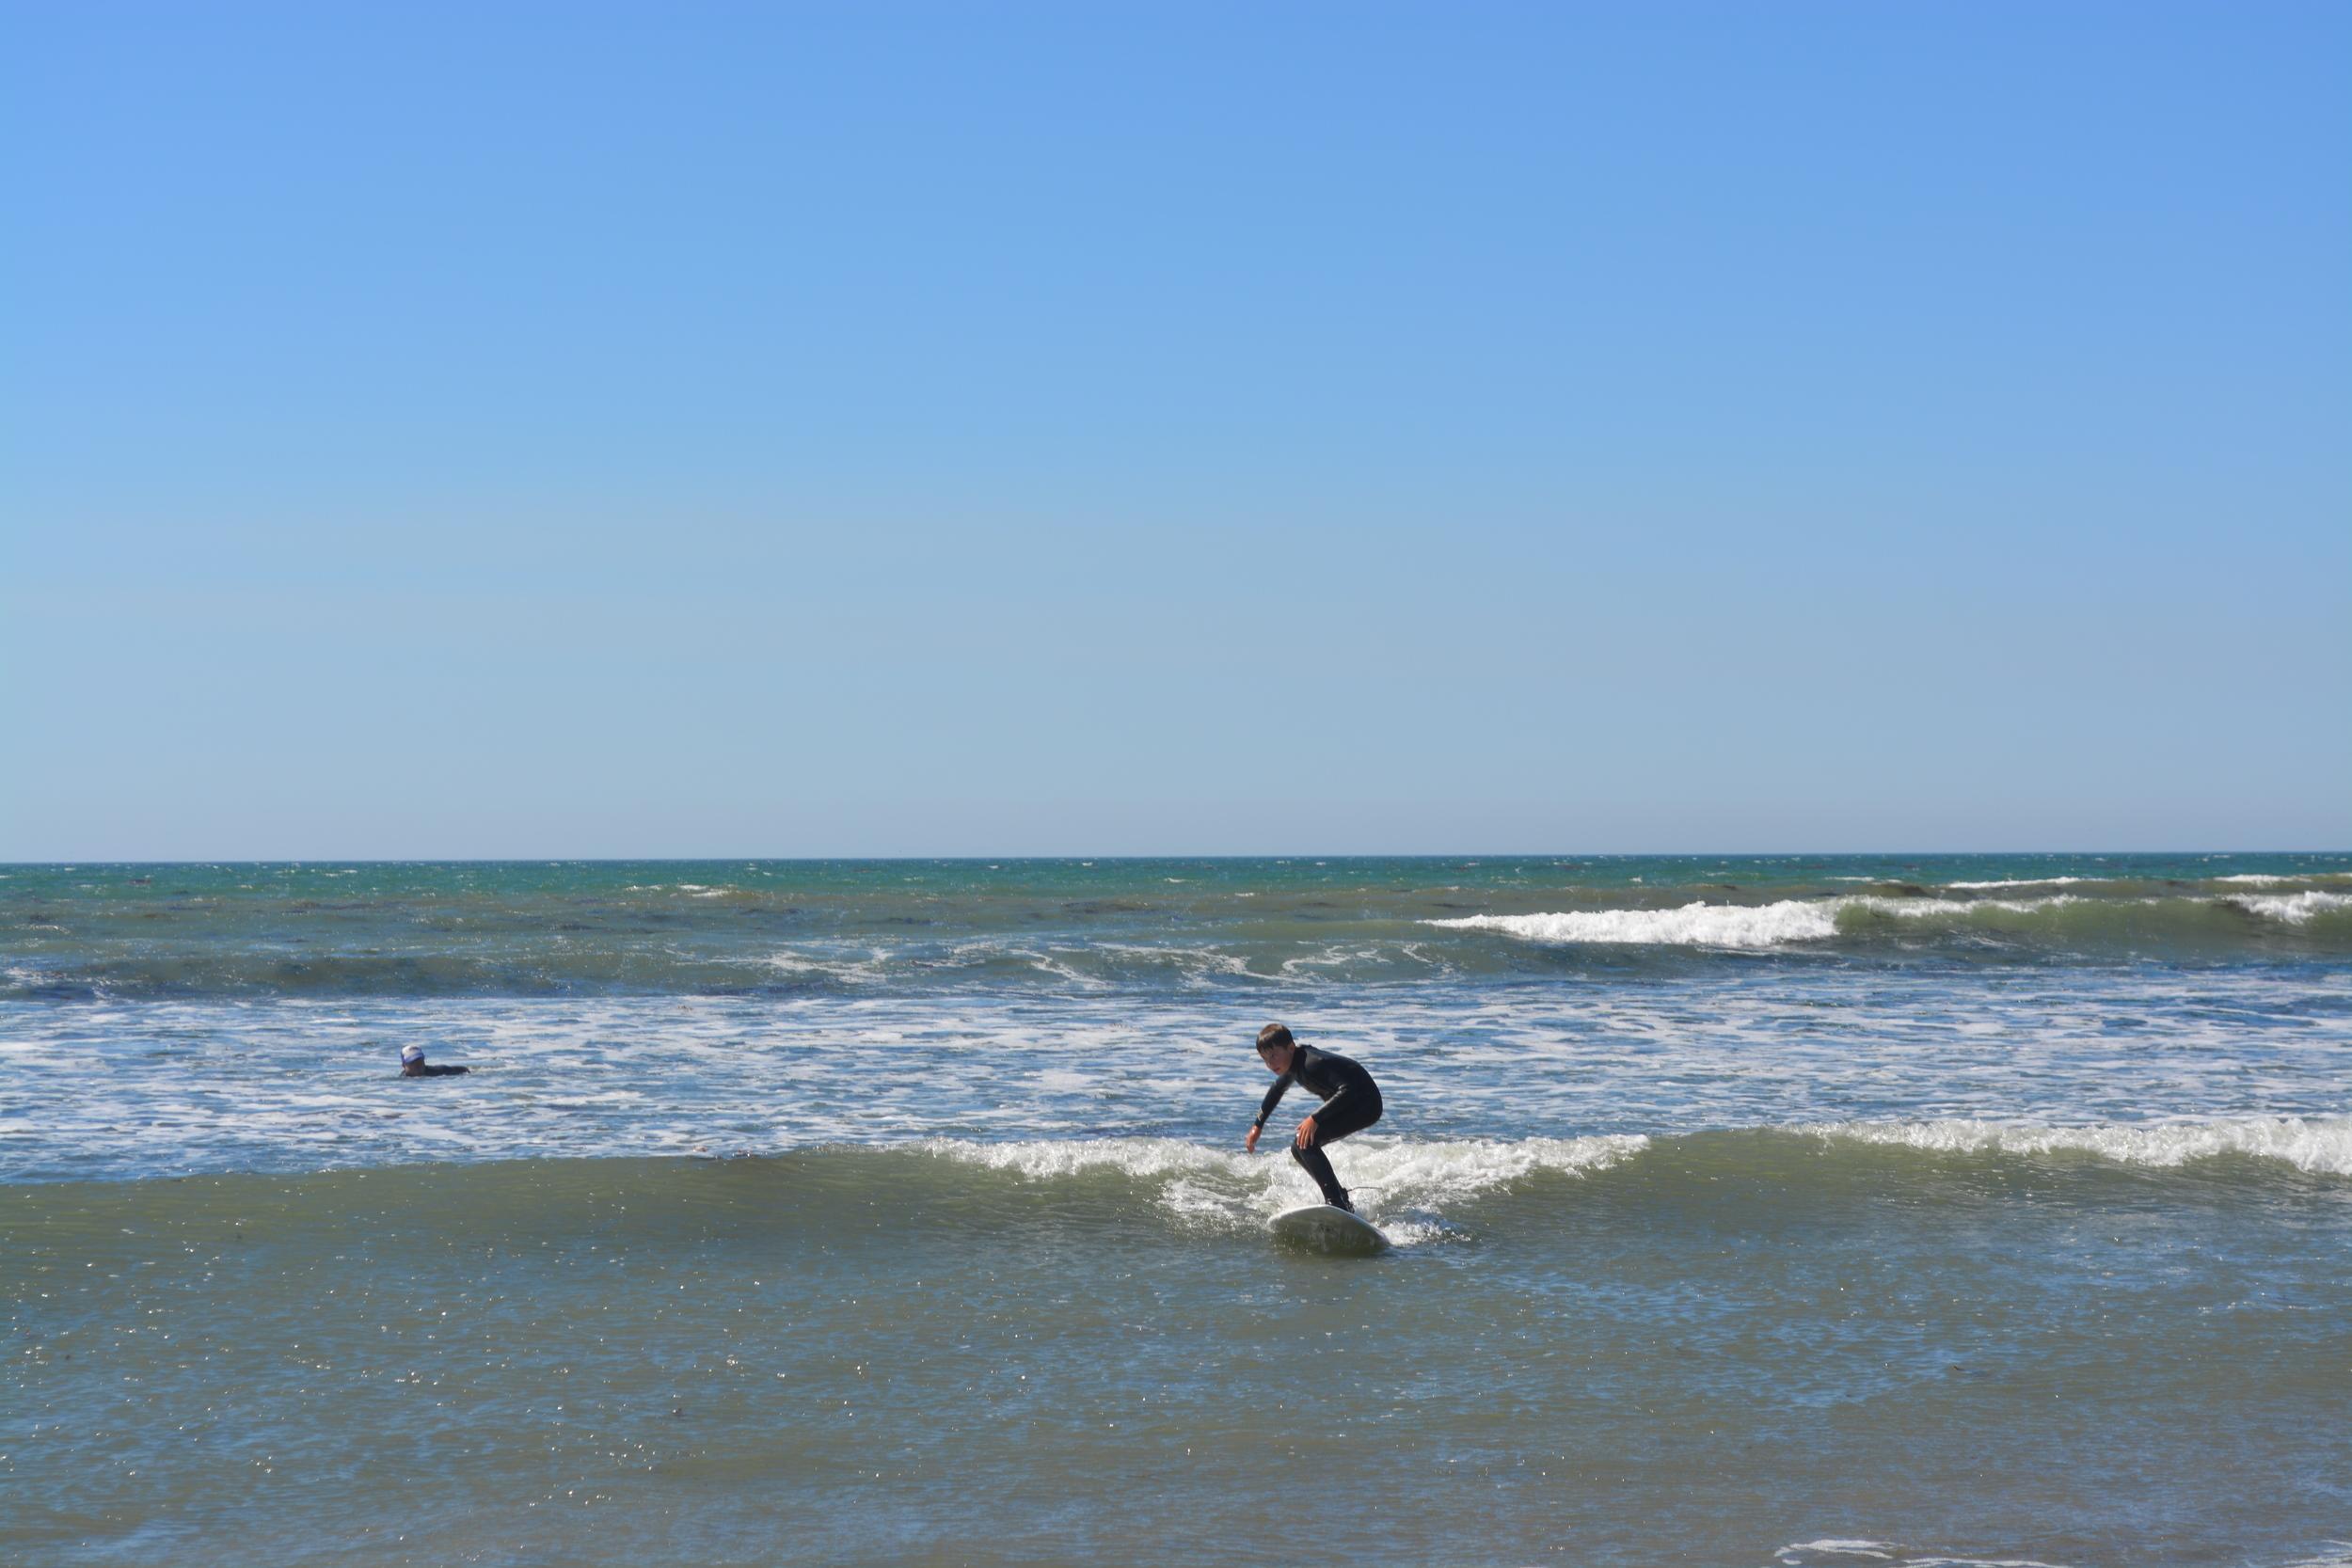 Baja California 10-5-13 Shipwrecks Surfing Adventure Ocean Experience Surf School San Diego (1).JPG